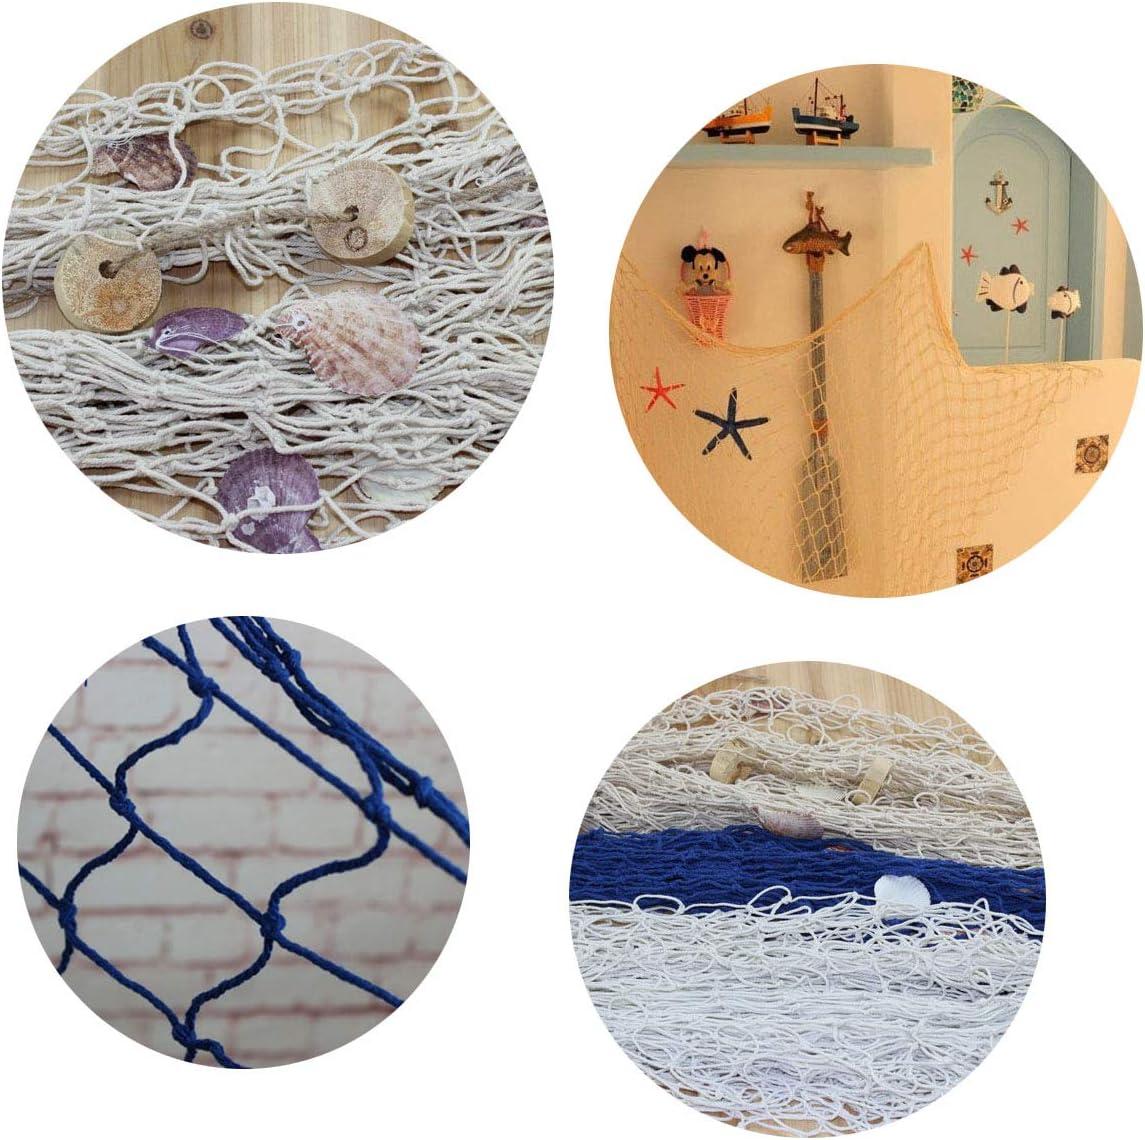 1 * 2M,1.5 * 2M Tangger 2 PCS Rete da Pesca Decorativa Blu e Beige,Rete da Pesca Decorativa Fotografie Decorative per Reti da Pesca Feste a Tema con Oceano Mediterraneo Pirate Beach